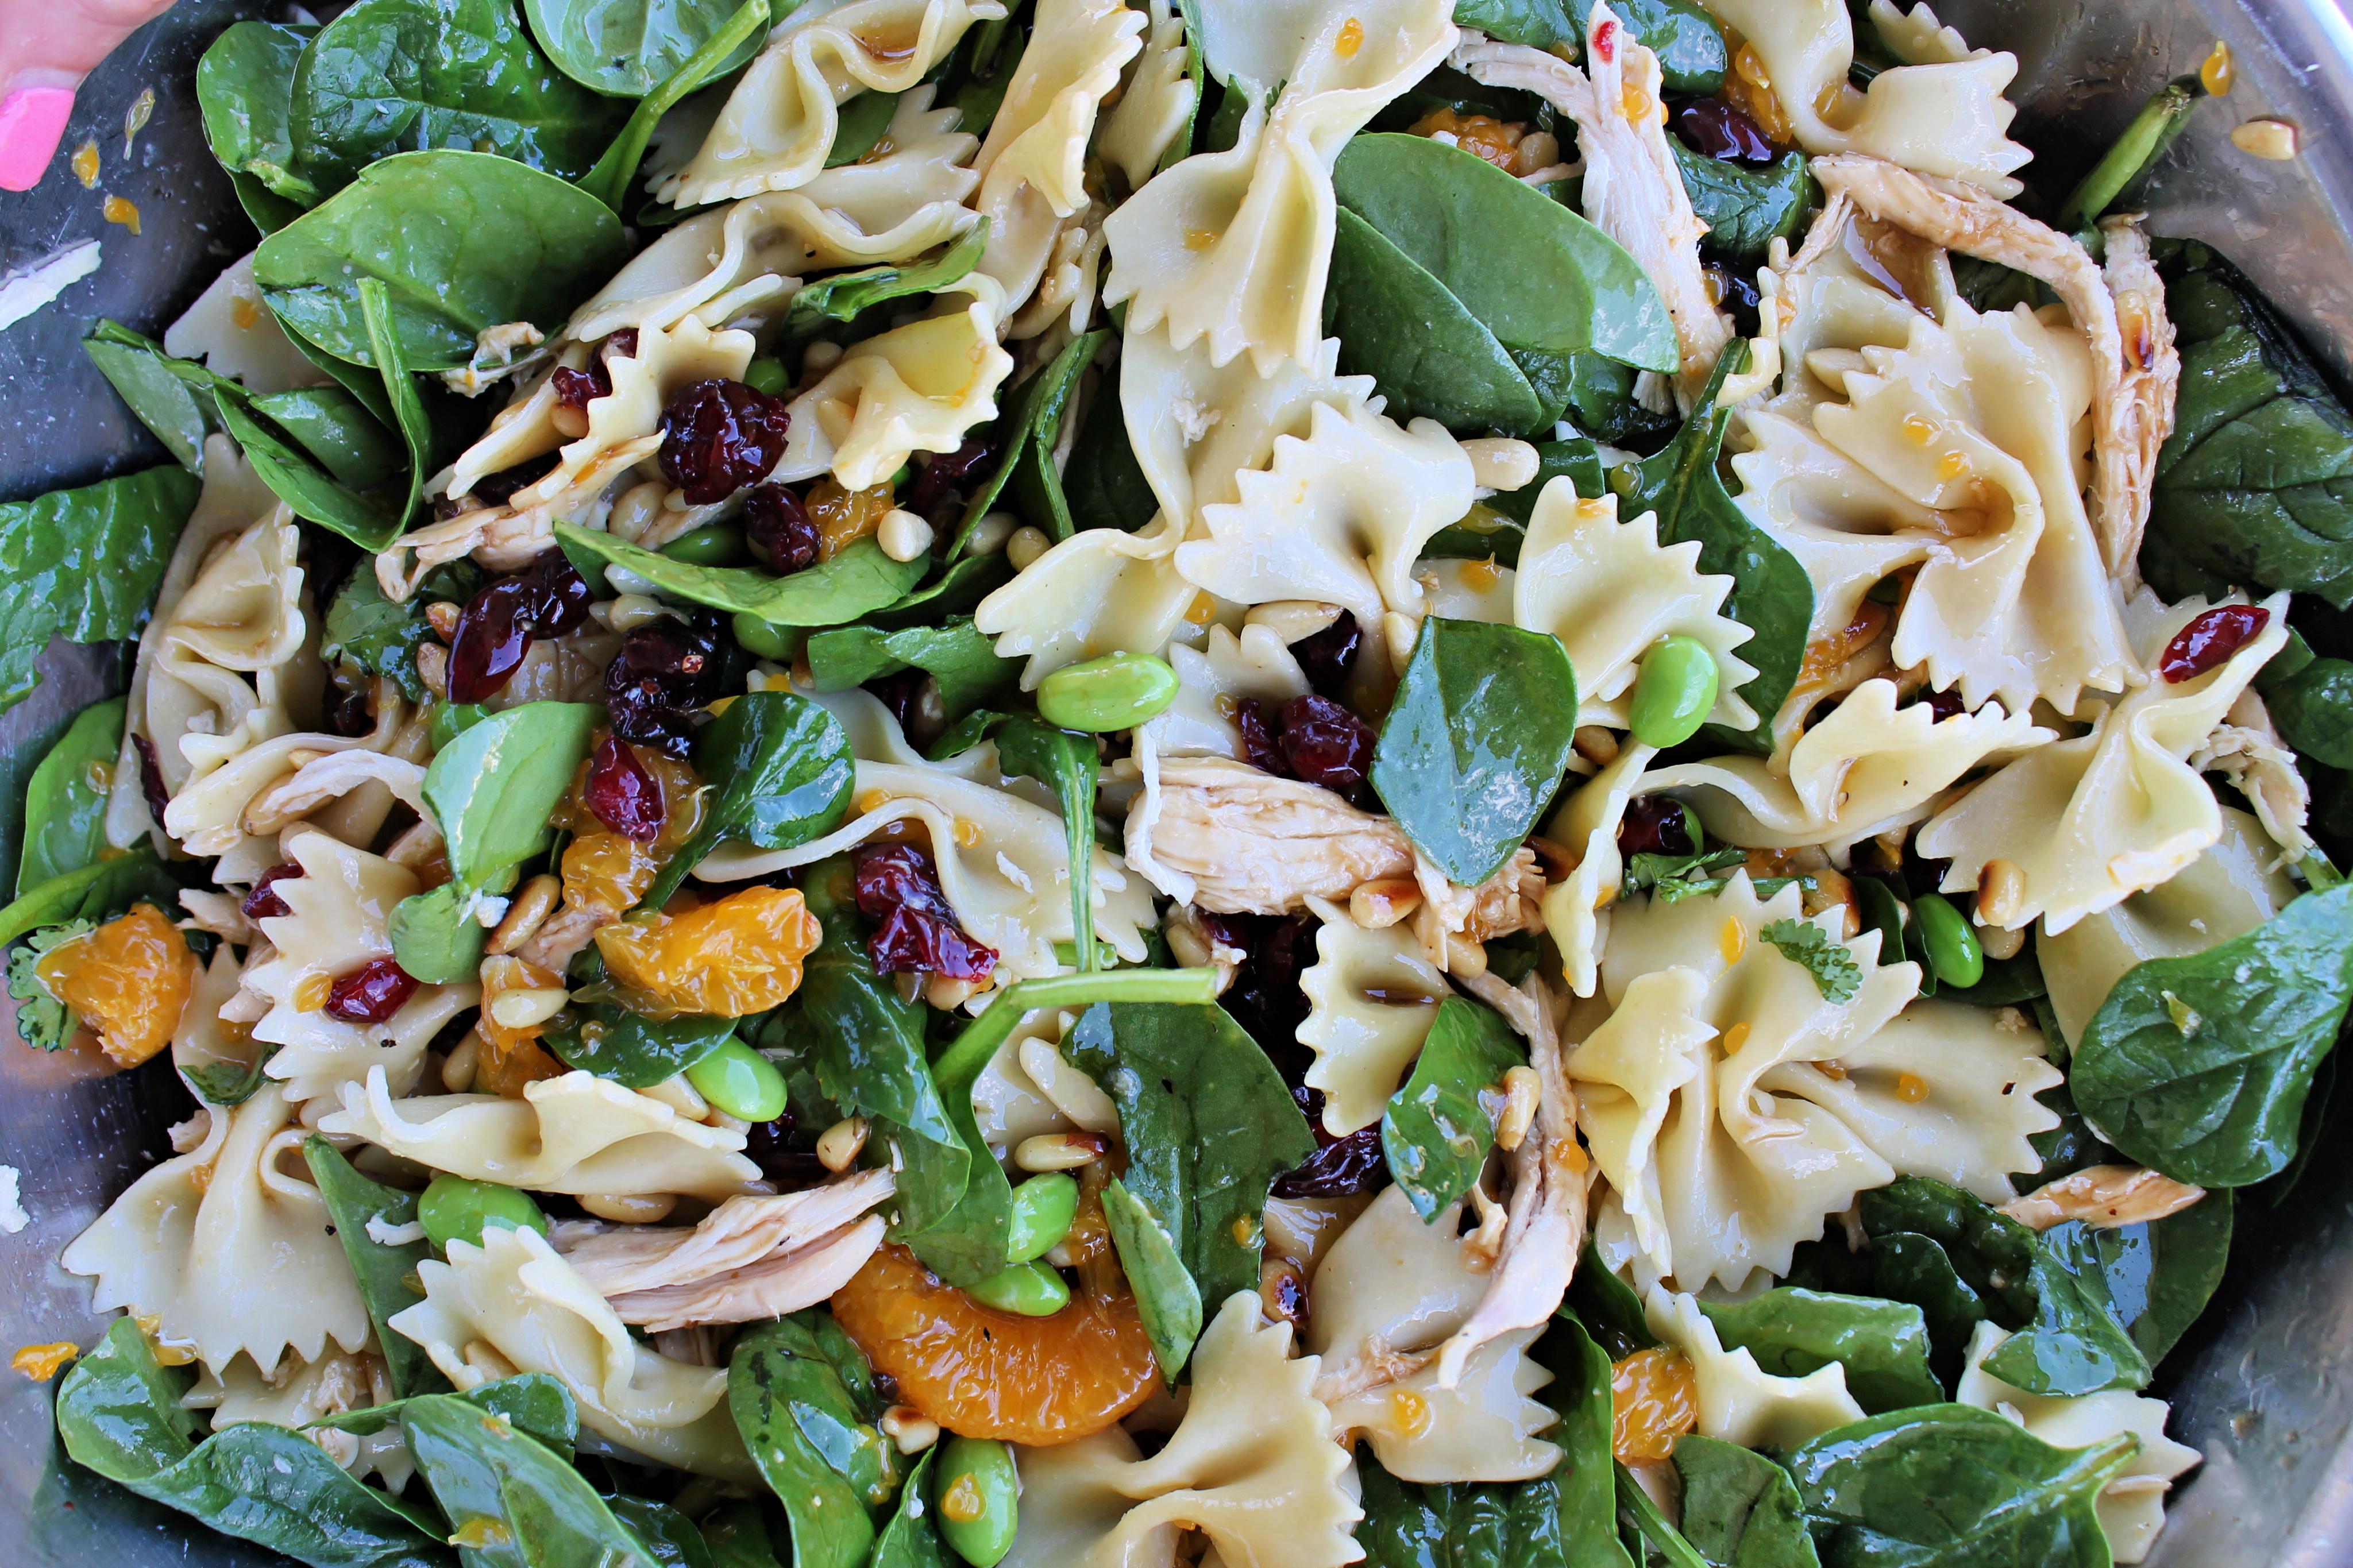 The BEST Oriental Pasta Salad Recipe!